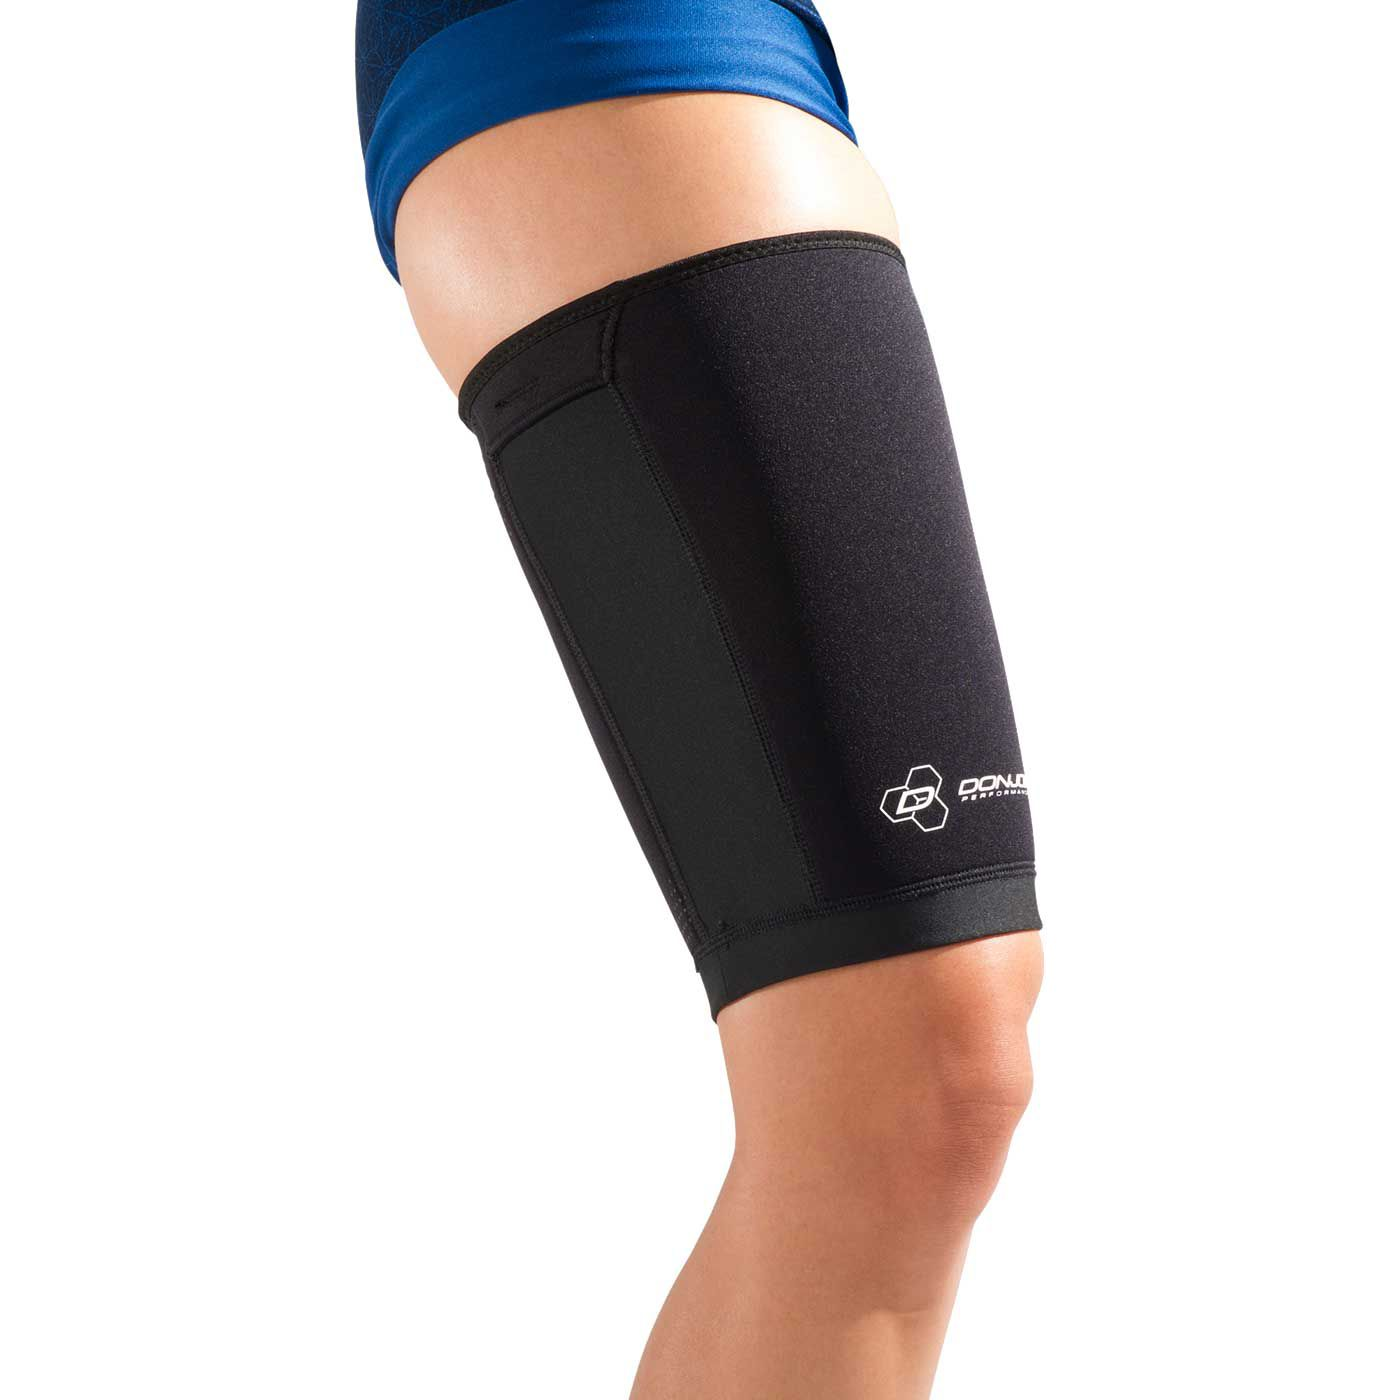 DonJoy Performance Anaform Compression Thigh Sleeve